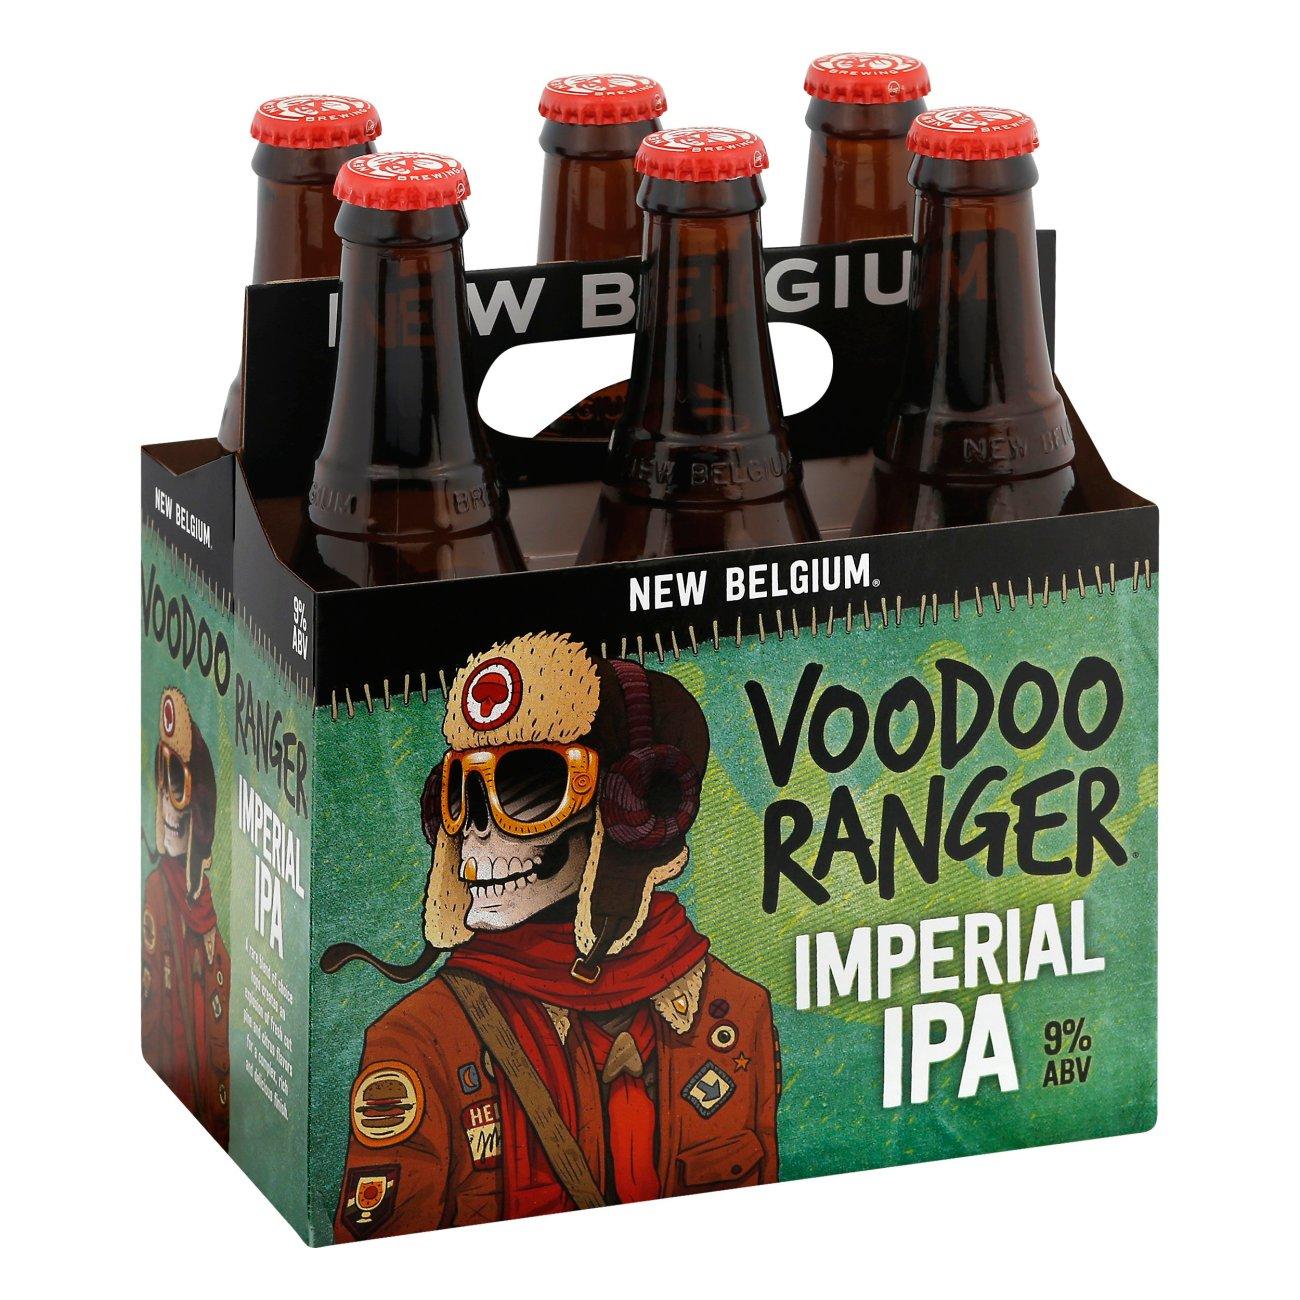 New Belgium Voodoo Ranger Imperial Ipa 12oz 6pk Bottles Biagio Wine Spirits